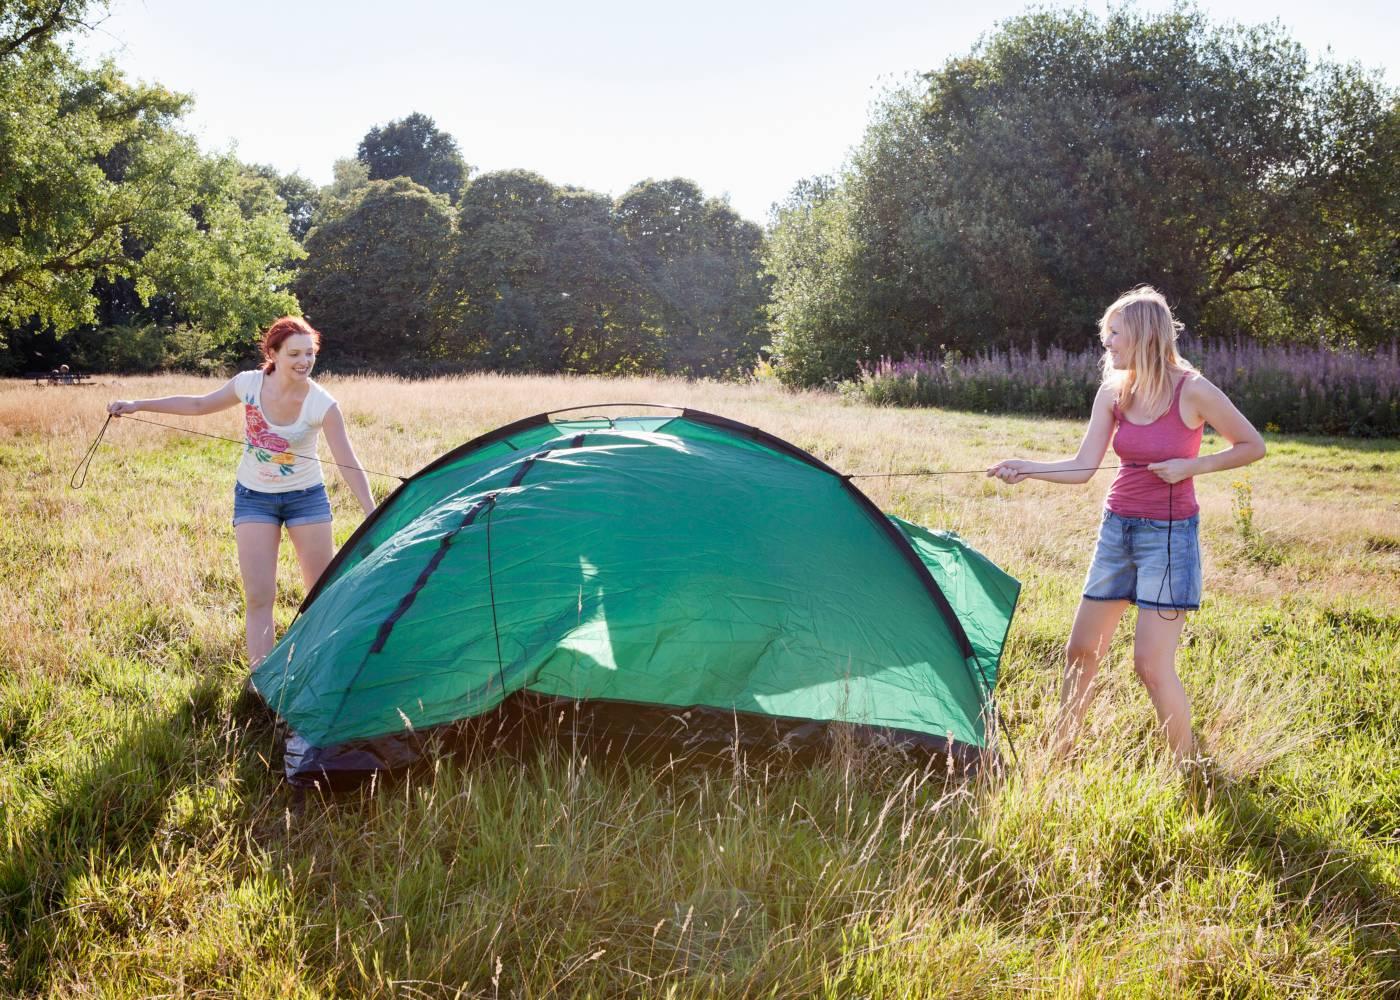 Raparigas jovens a montar tenda de campismo